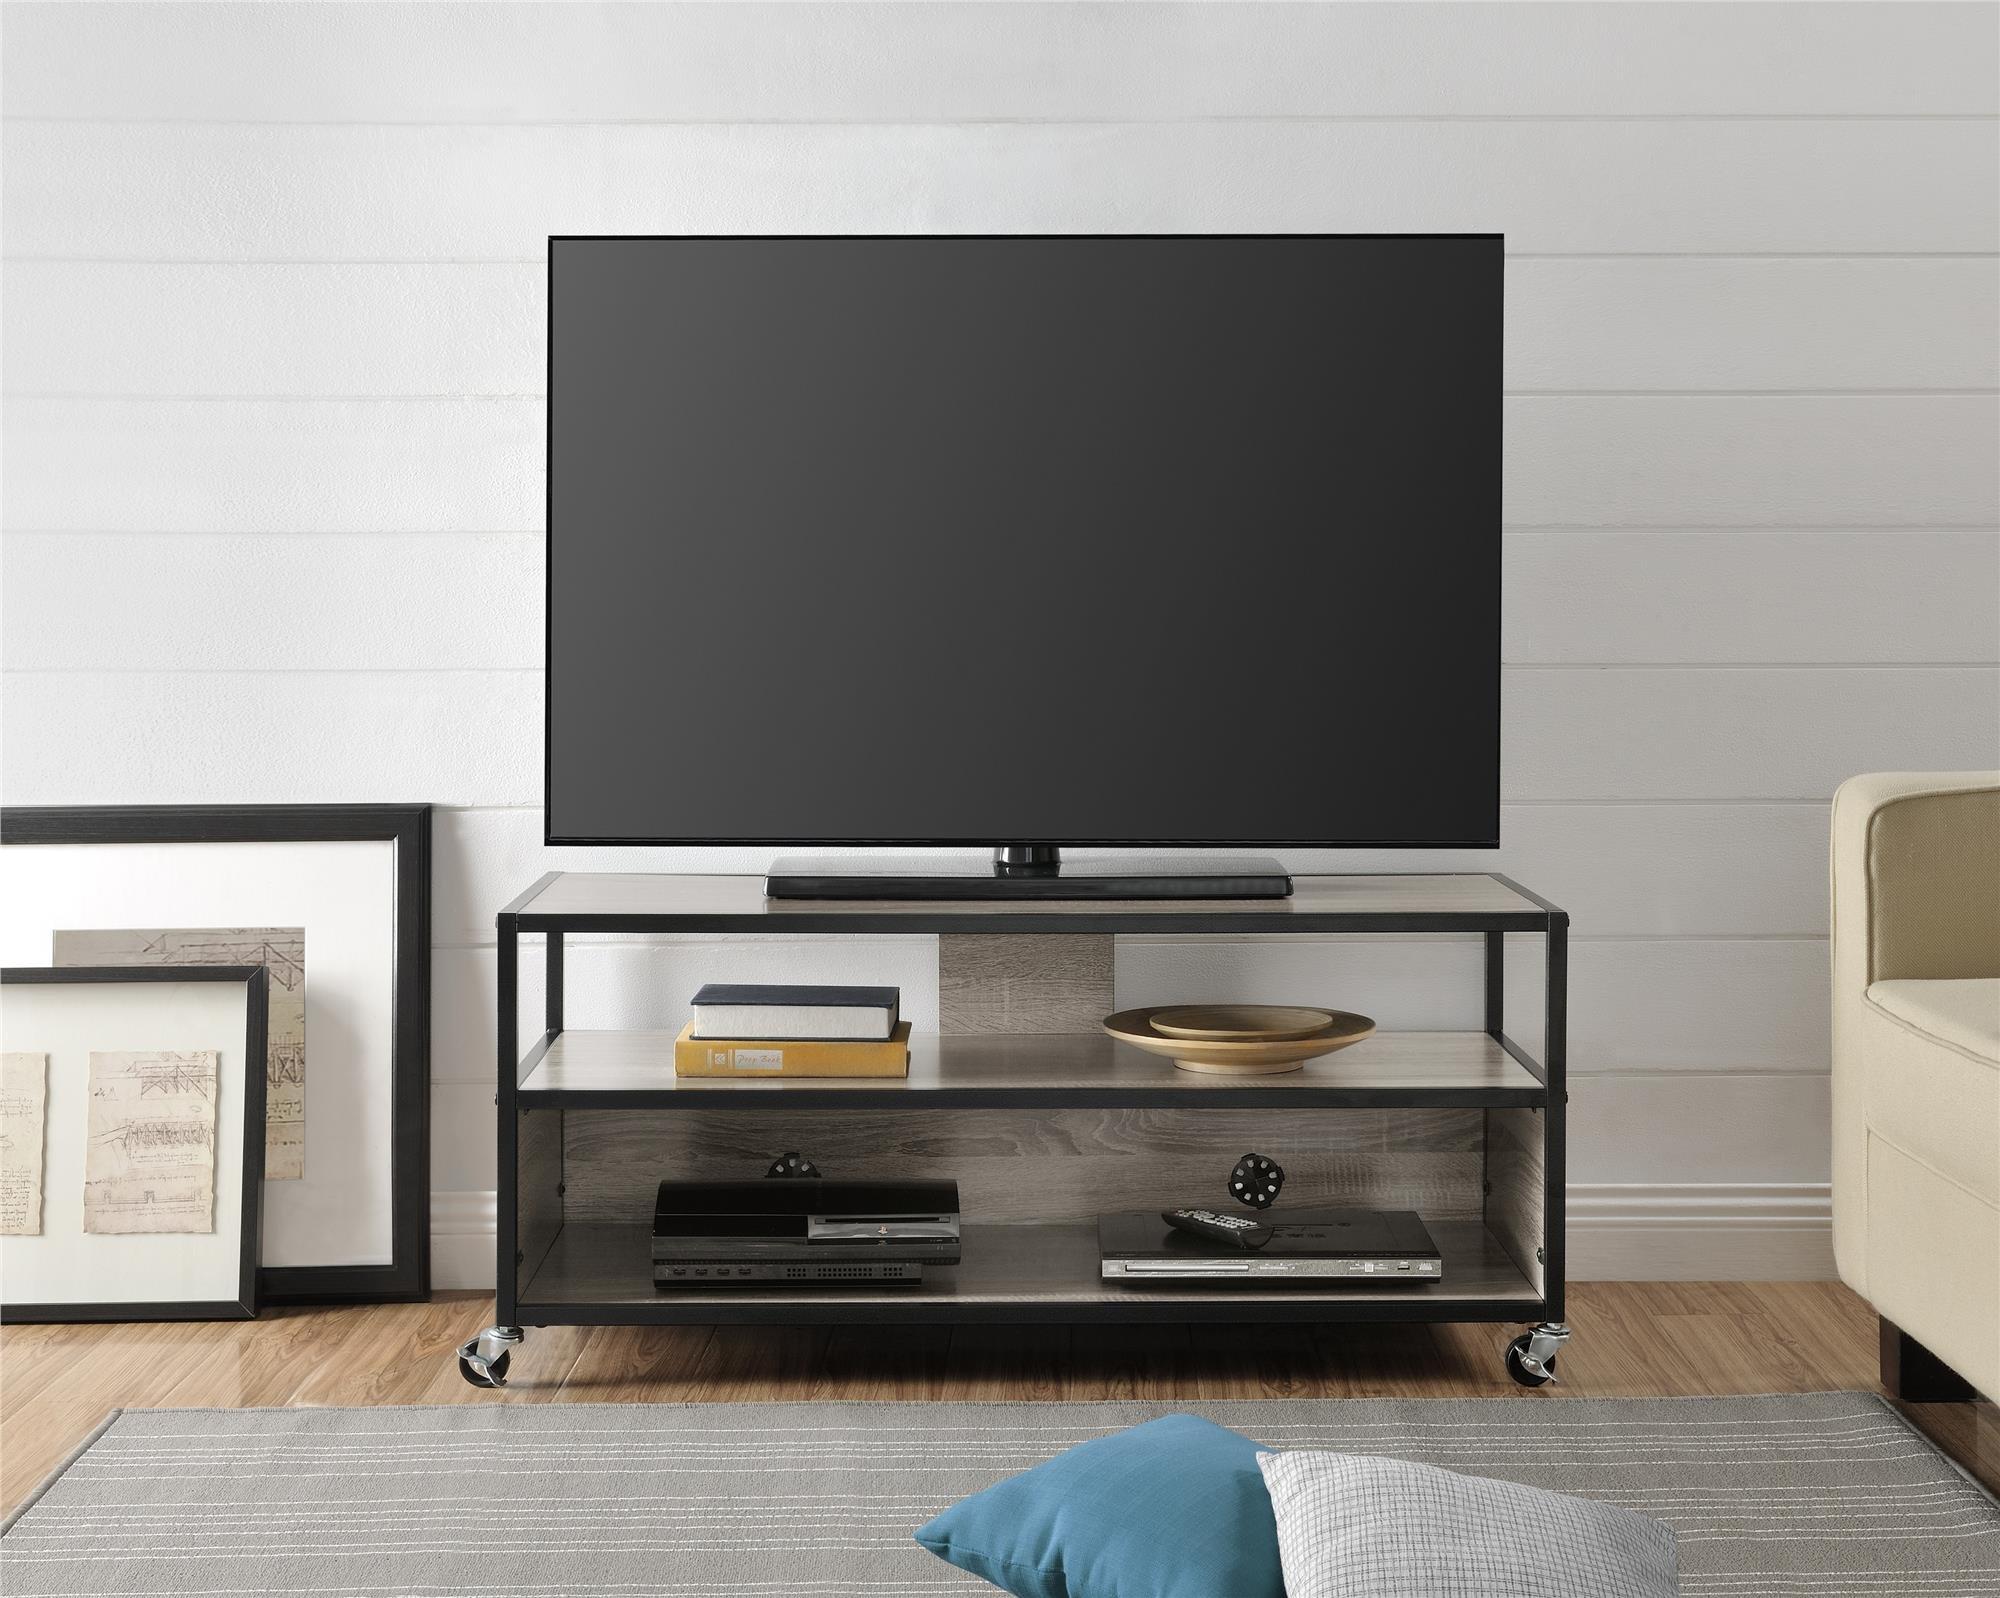 Altra Mason Ridge Mobile 46'' TV Stand with Metal Frame, Sonoma Oak/Black by Altra Furniture (Image #3)